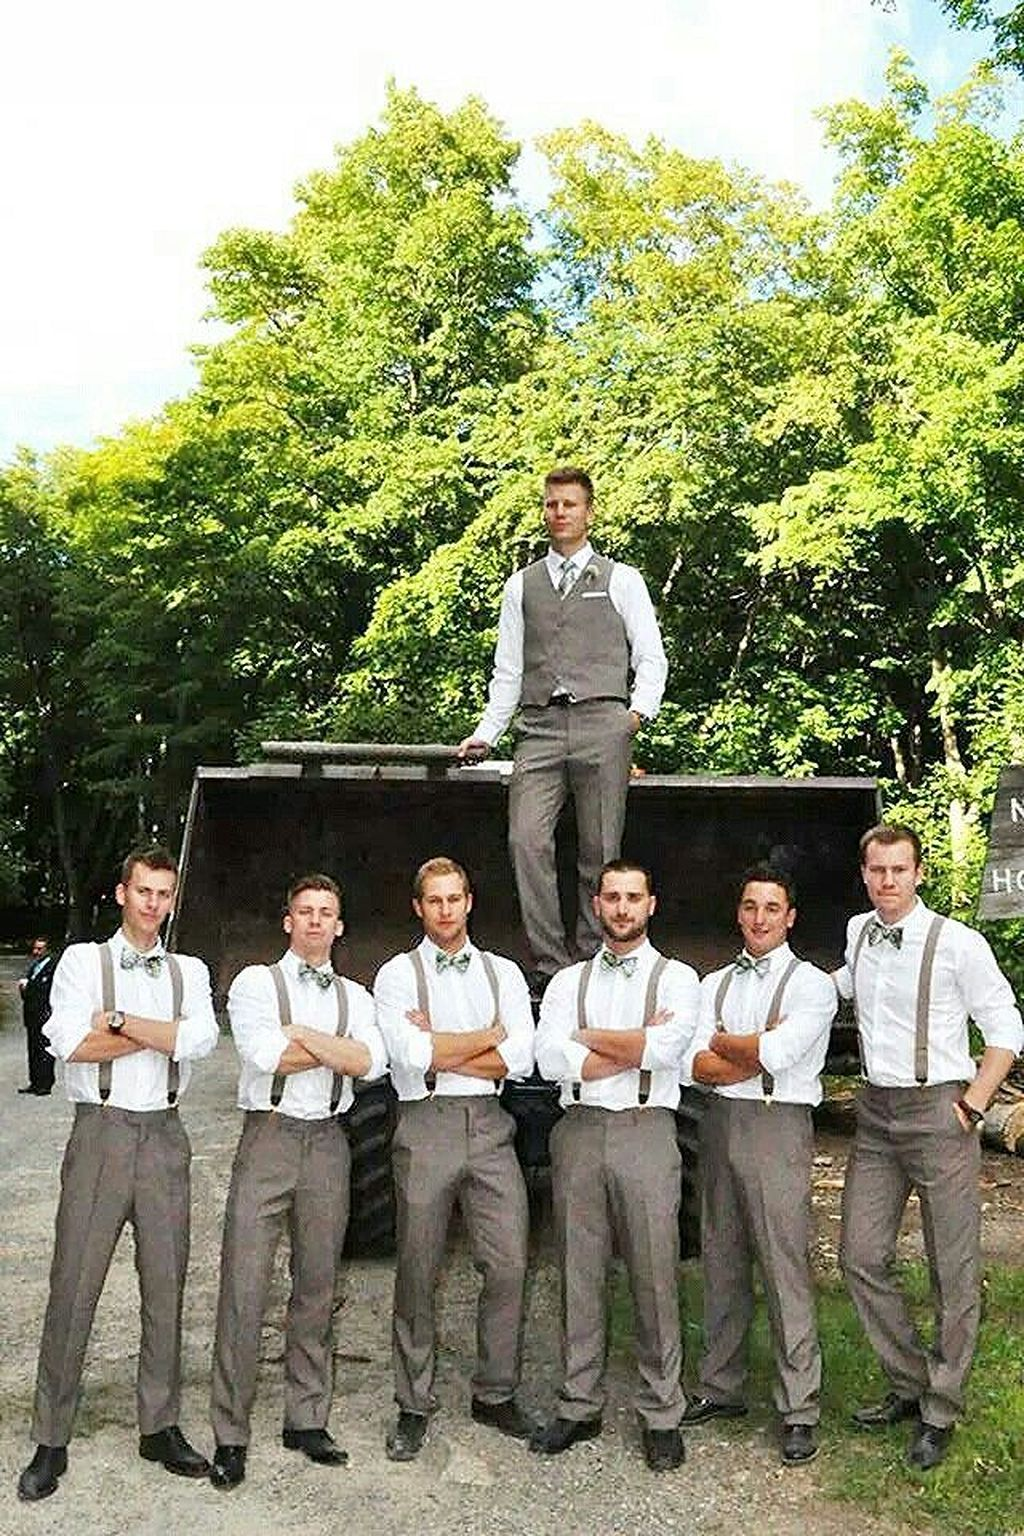 groomsmen photo shoot ideas unique weddings weddings and favors